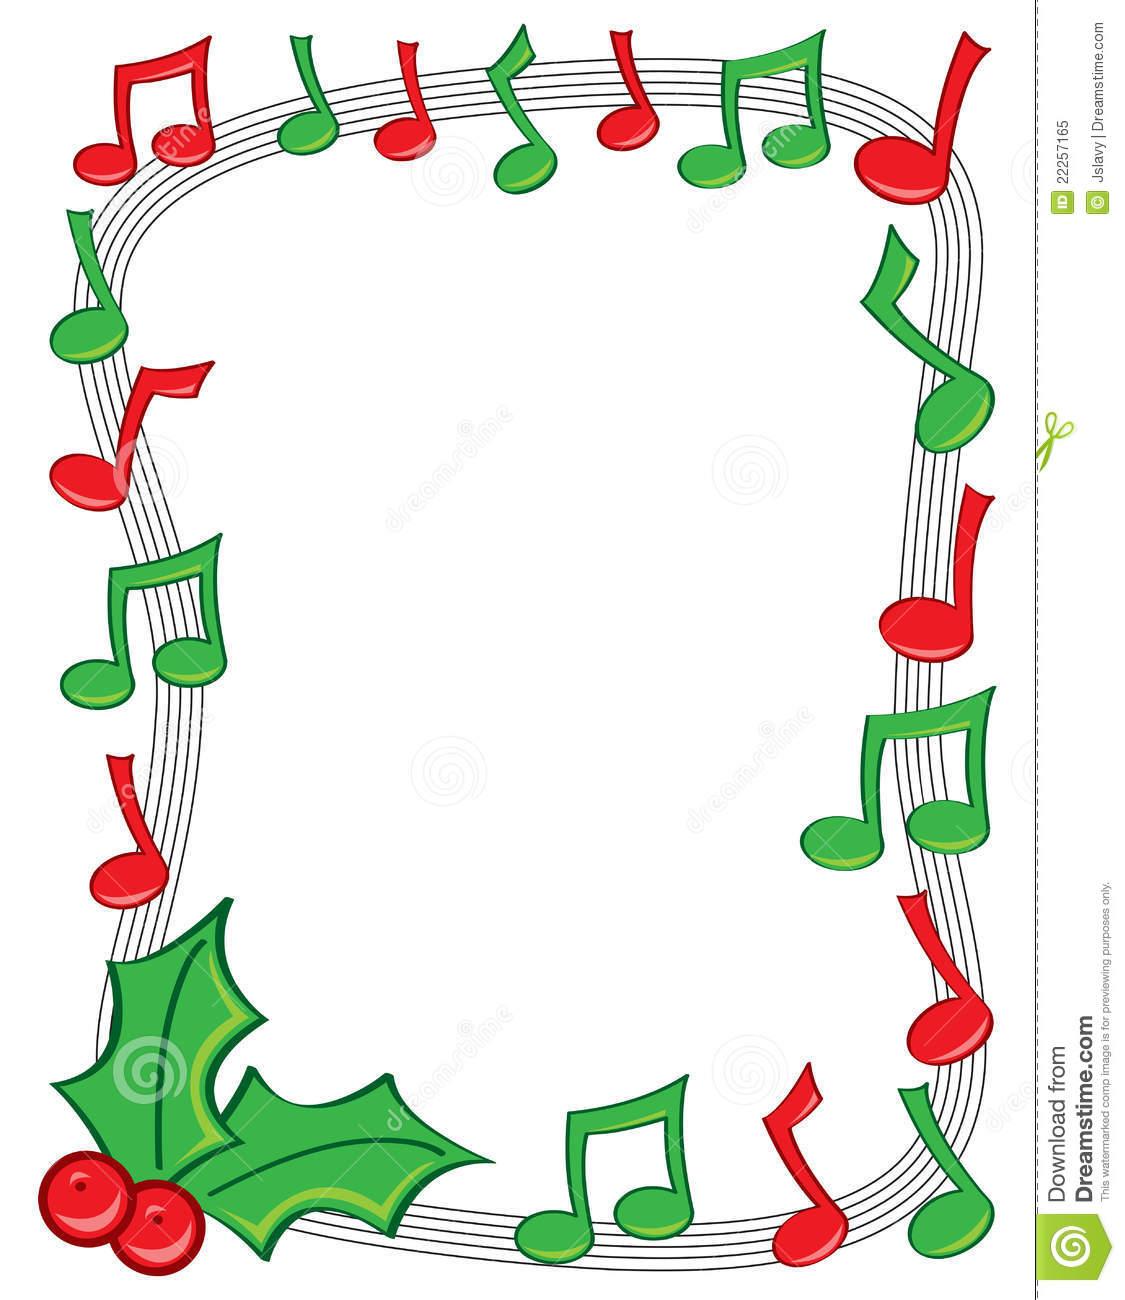 Chorus clipart carol service. Christmas choir free download